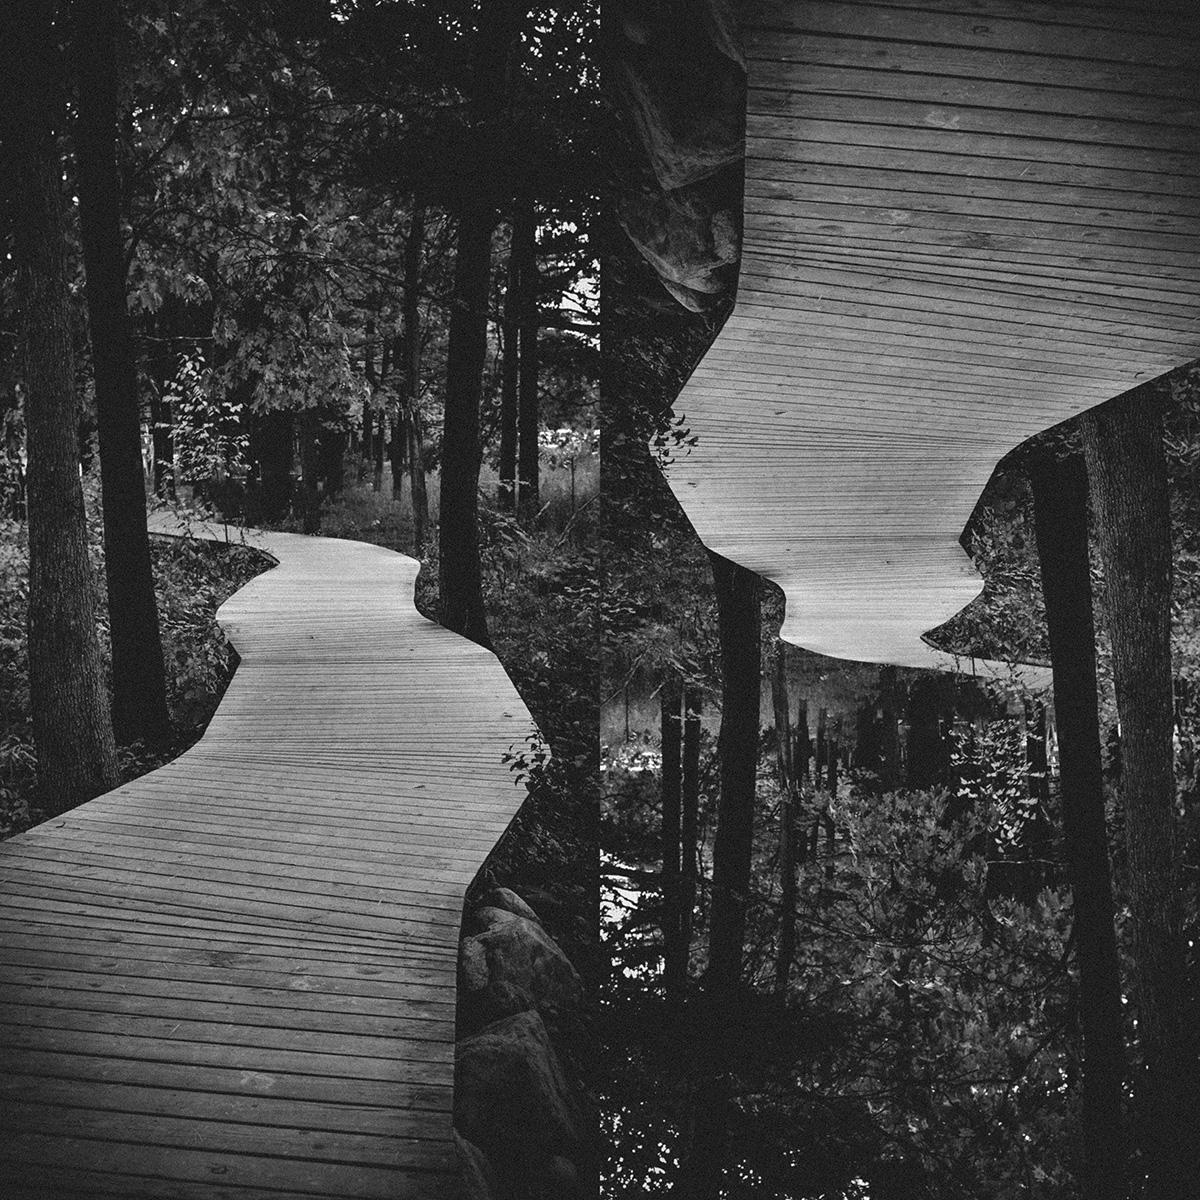 Chemin d'illusion